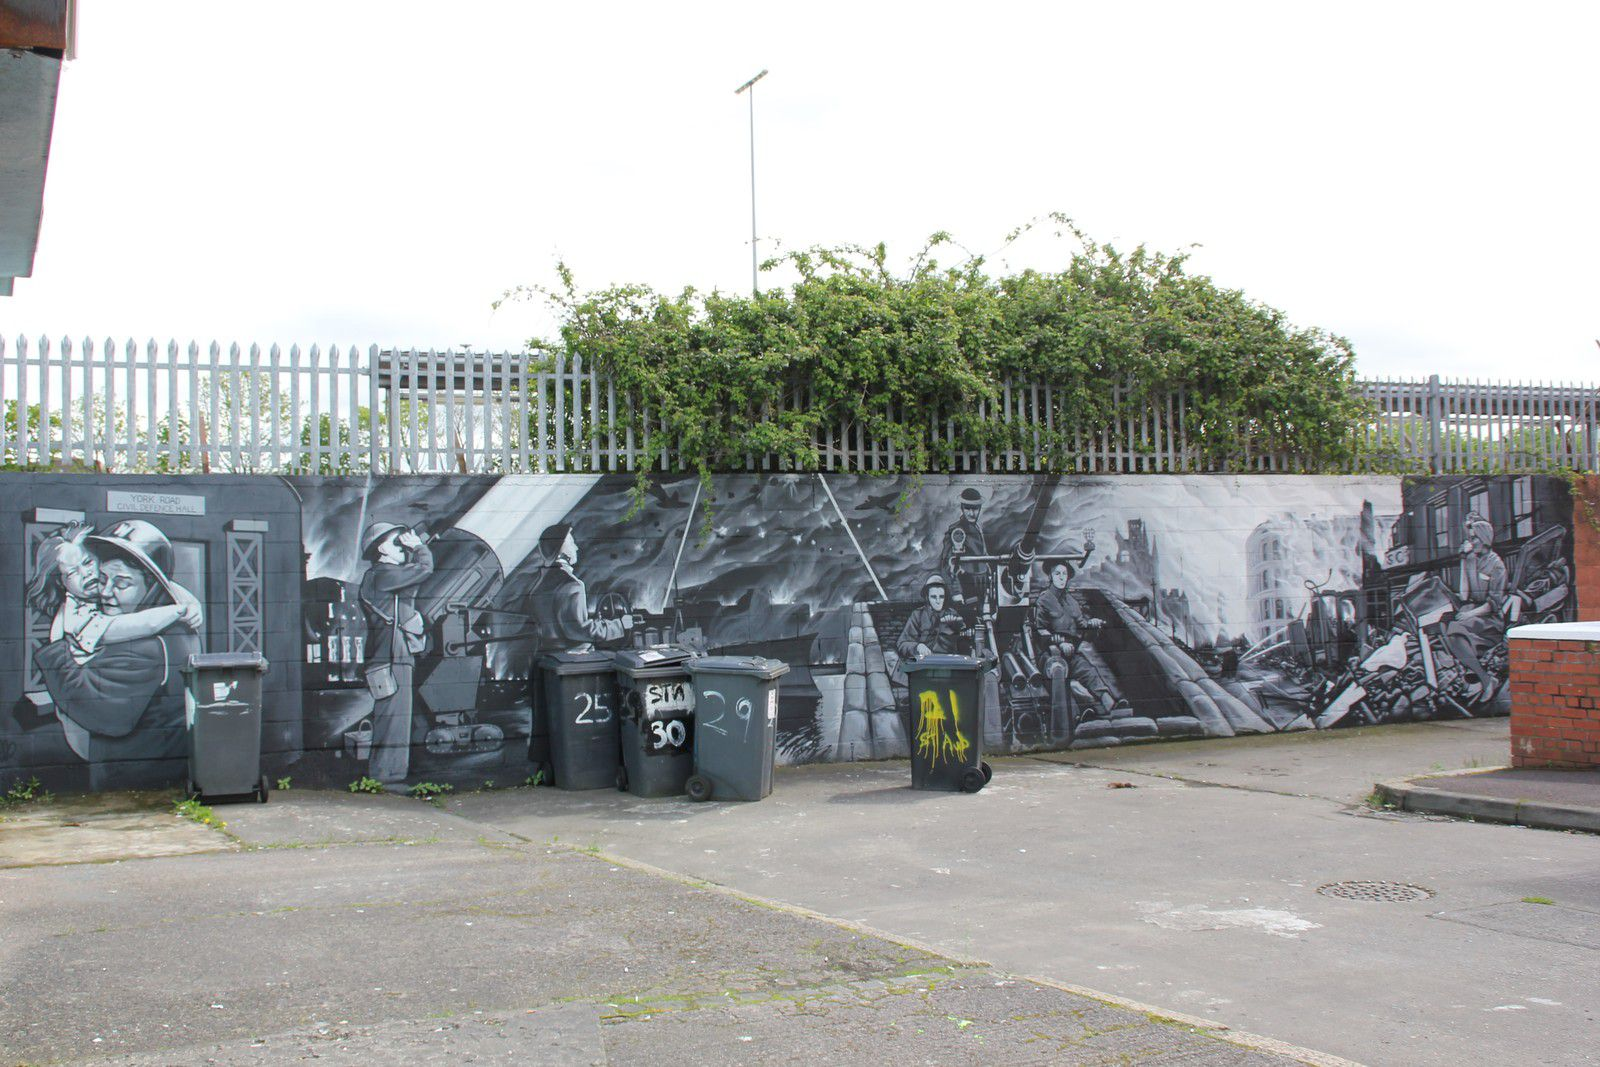 821) Saint Aubyn Street, North Belfast